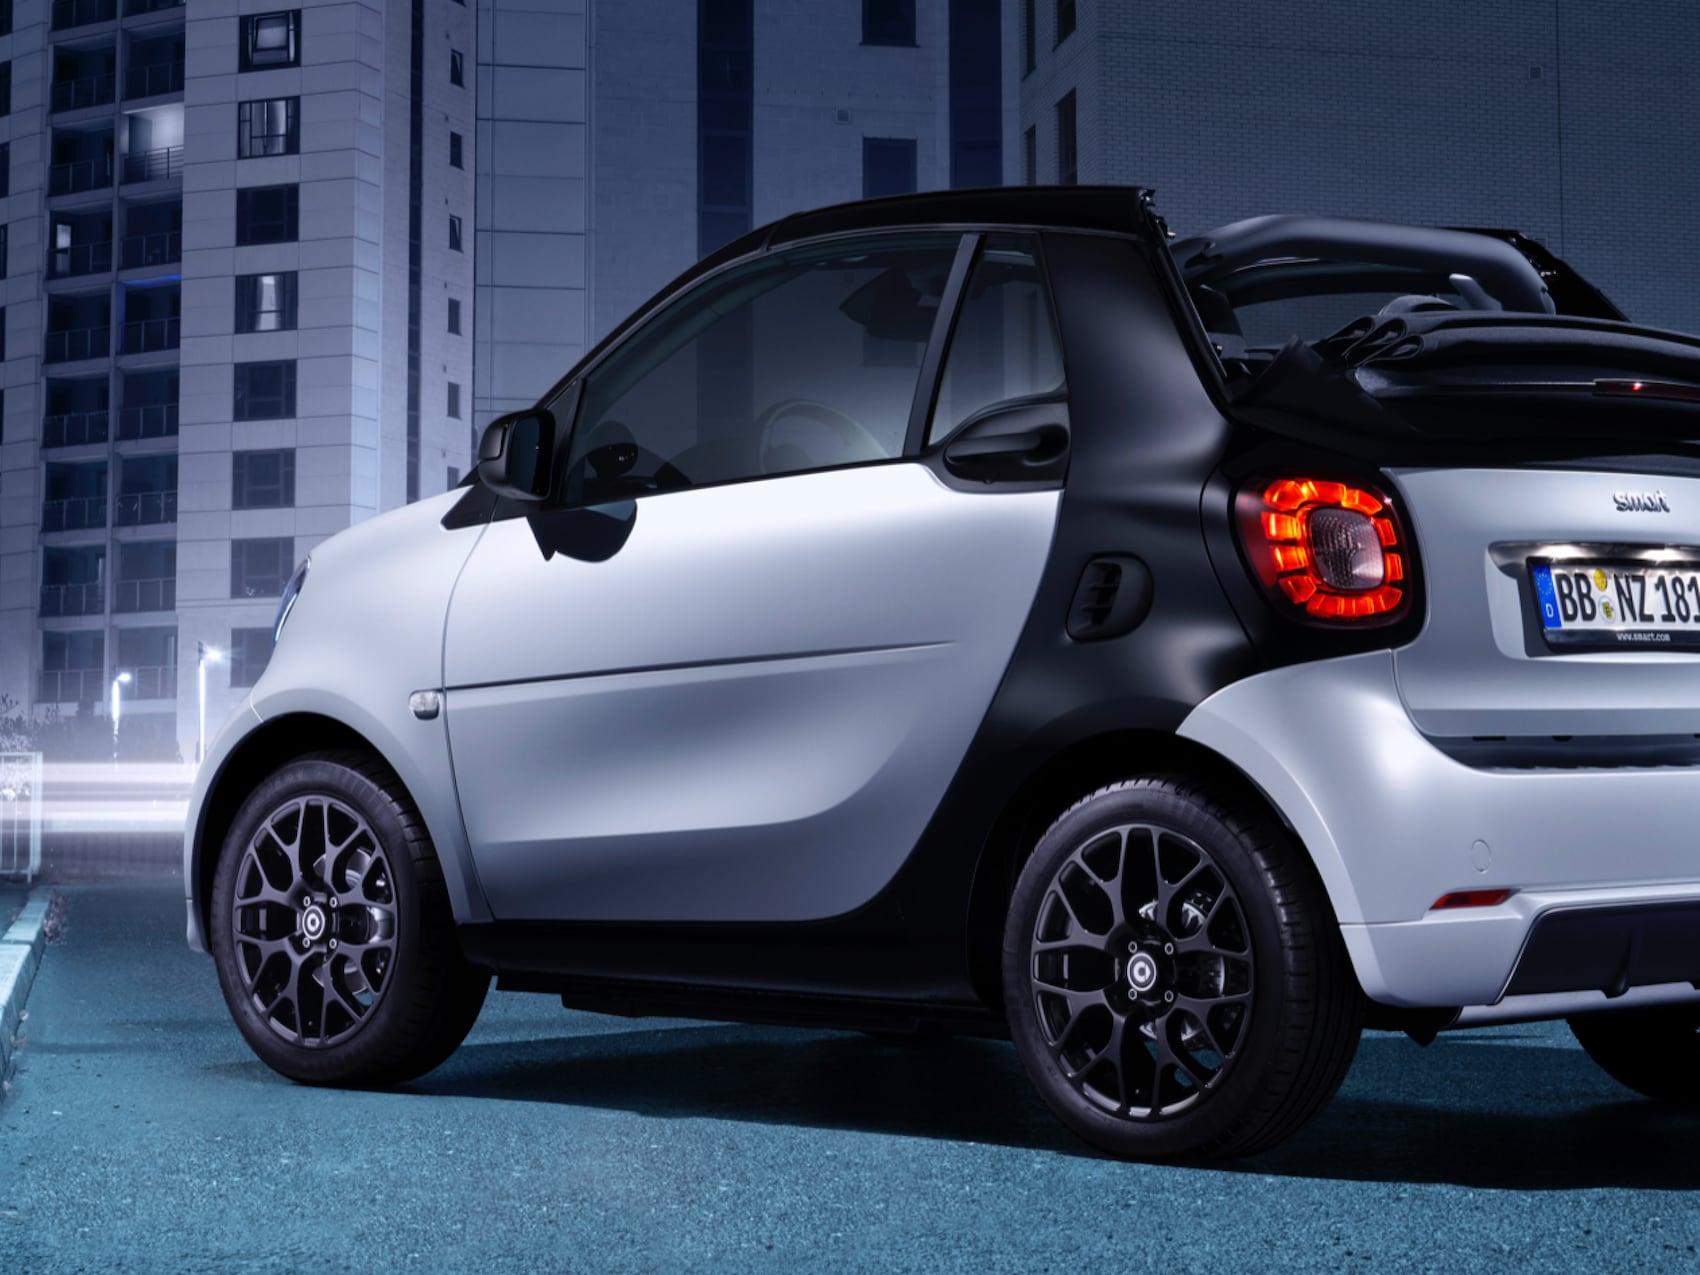 smart-fortwo-cabrio-edition-urbanshadow_B_Card_Intro